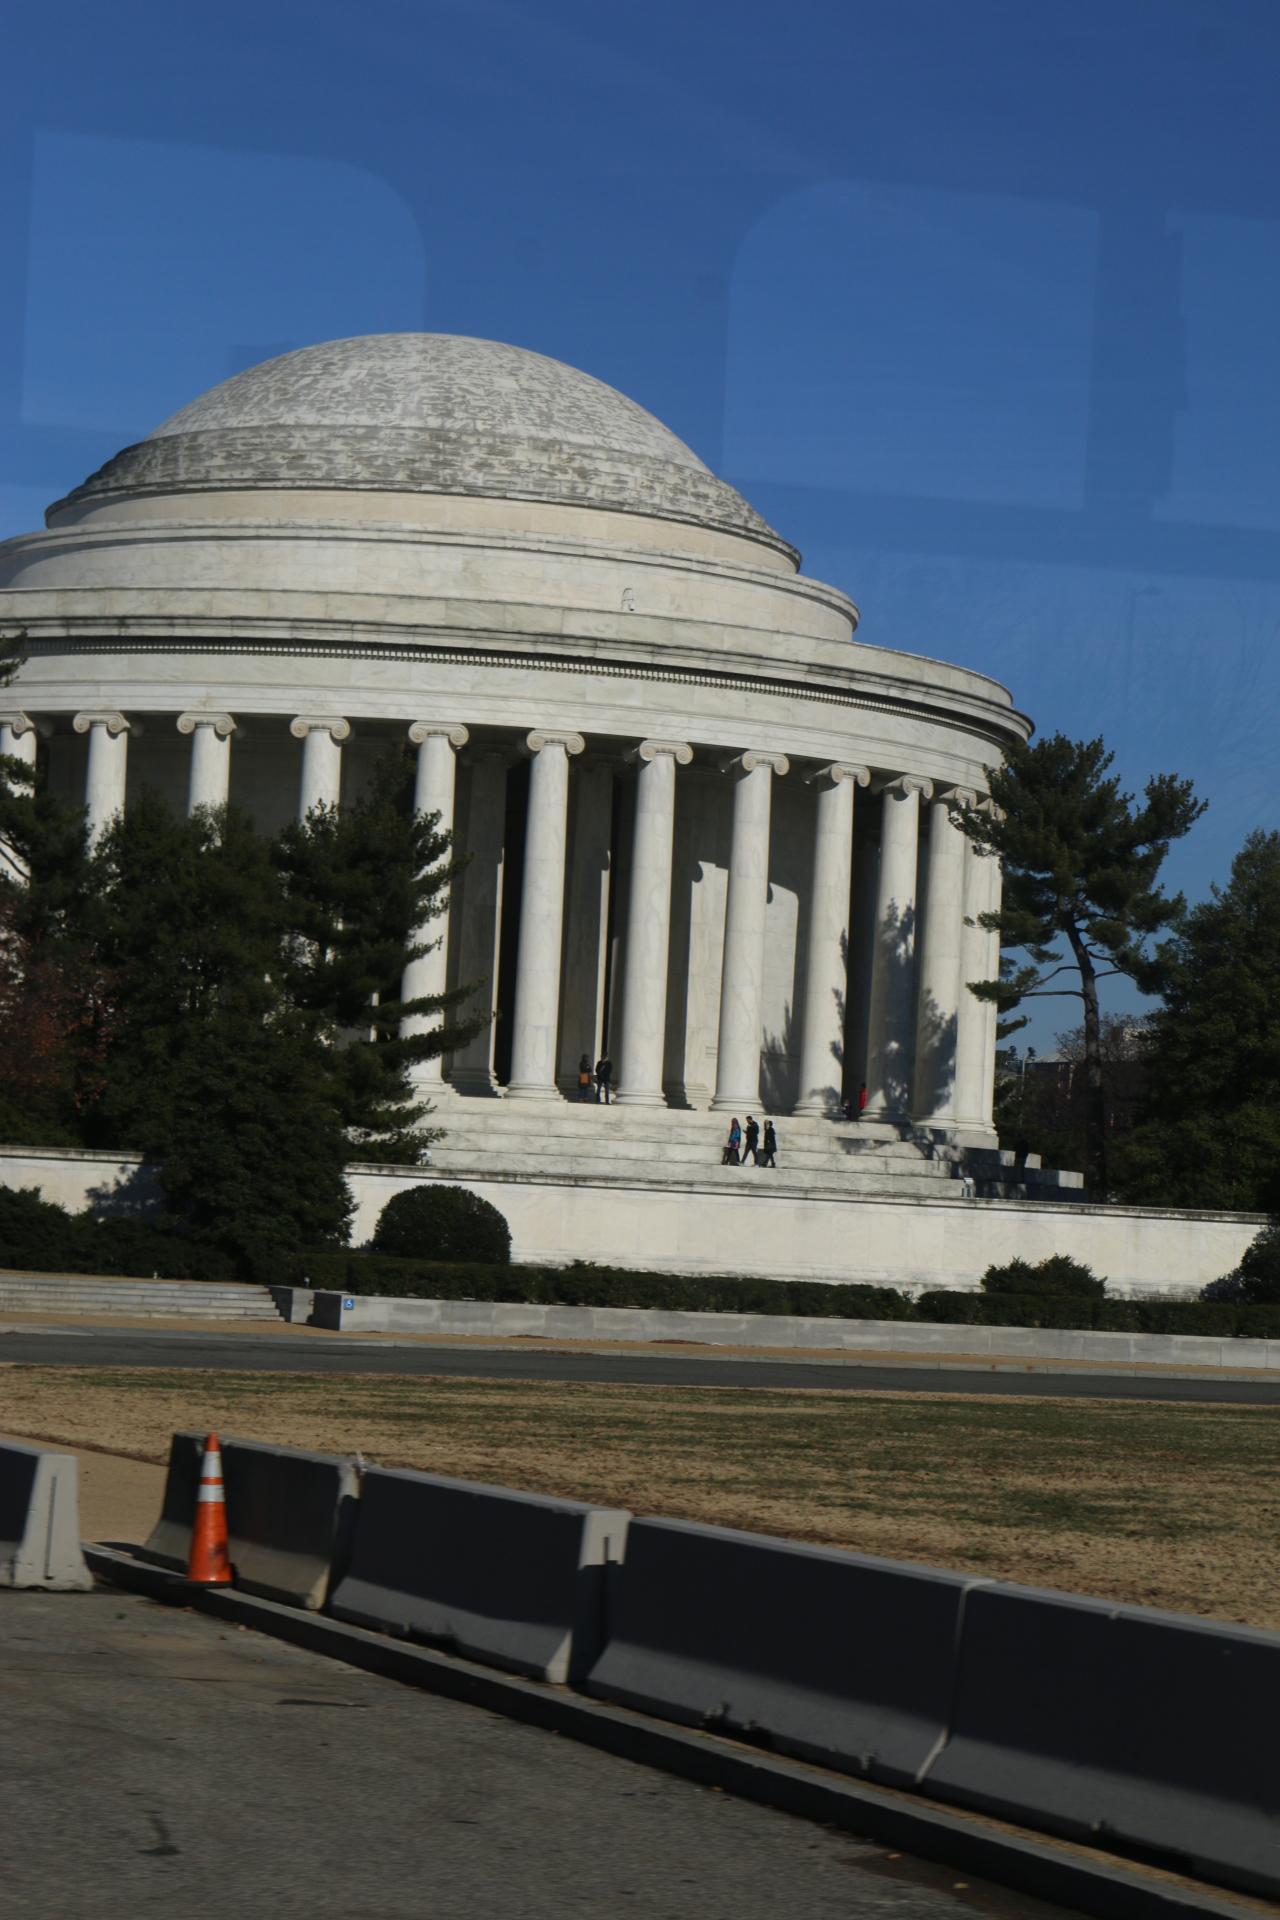 WASHINGTON D.C IN A DAY